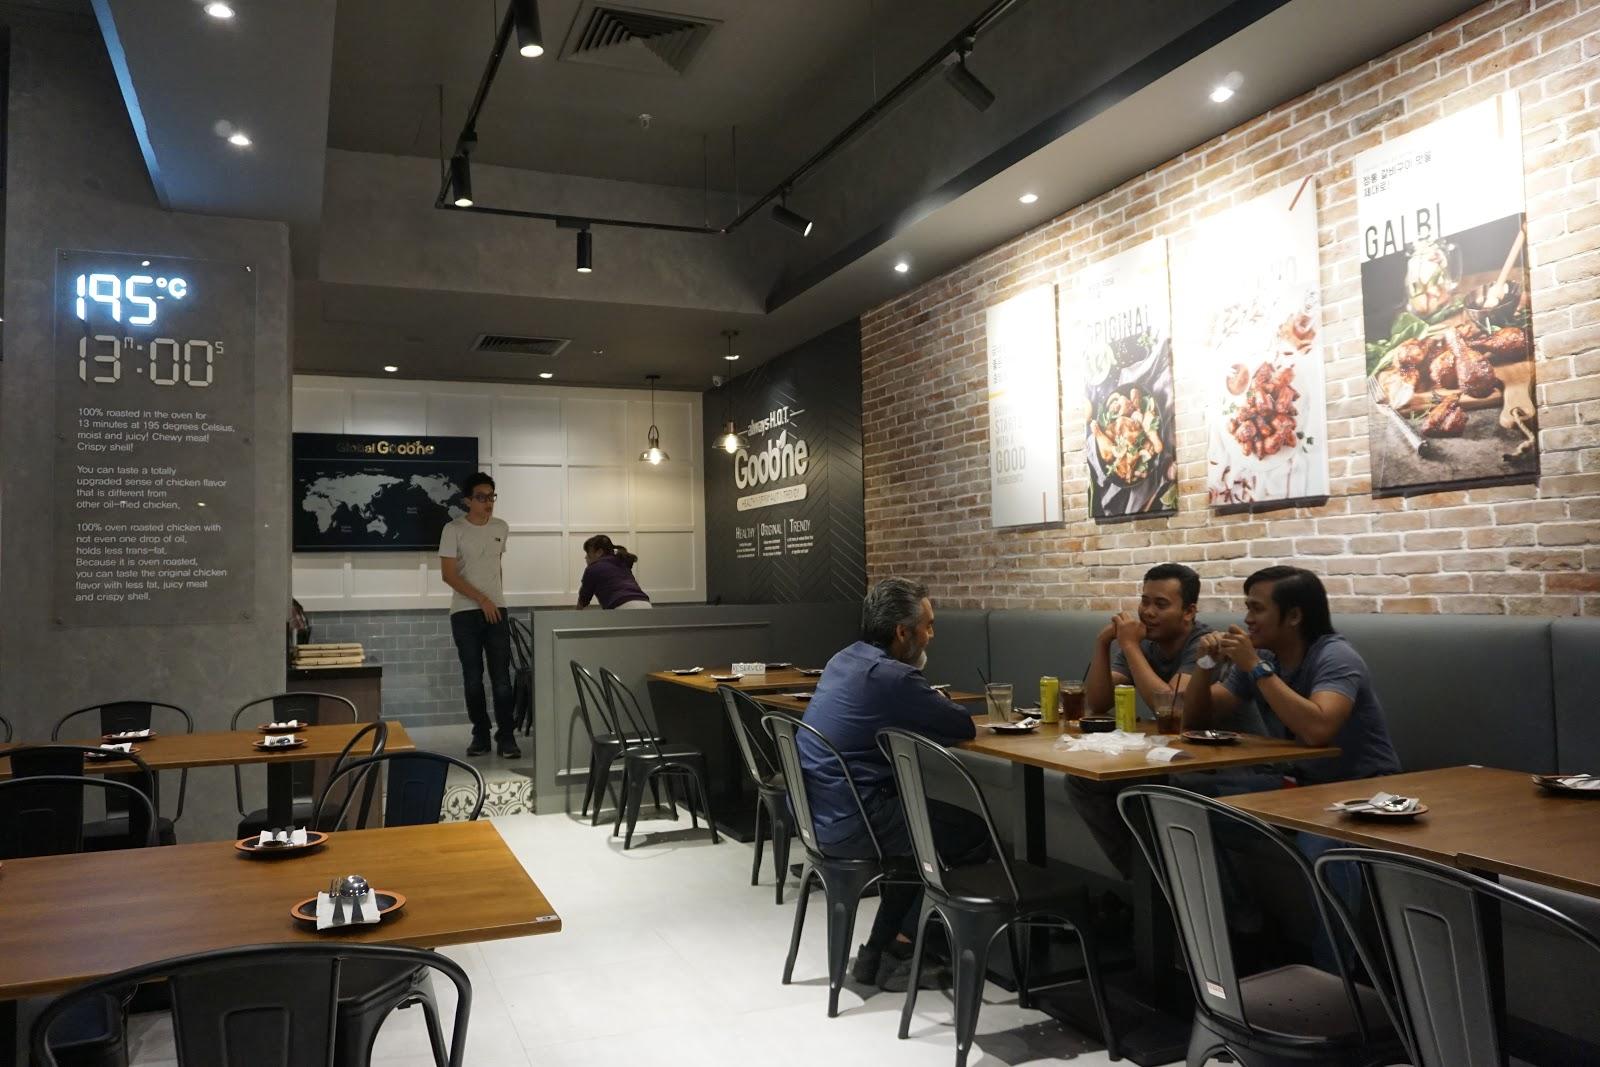 KOREAN FOOD, GOOBNE MALAYSIA